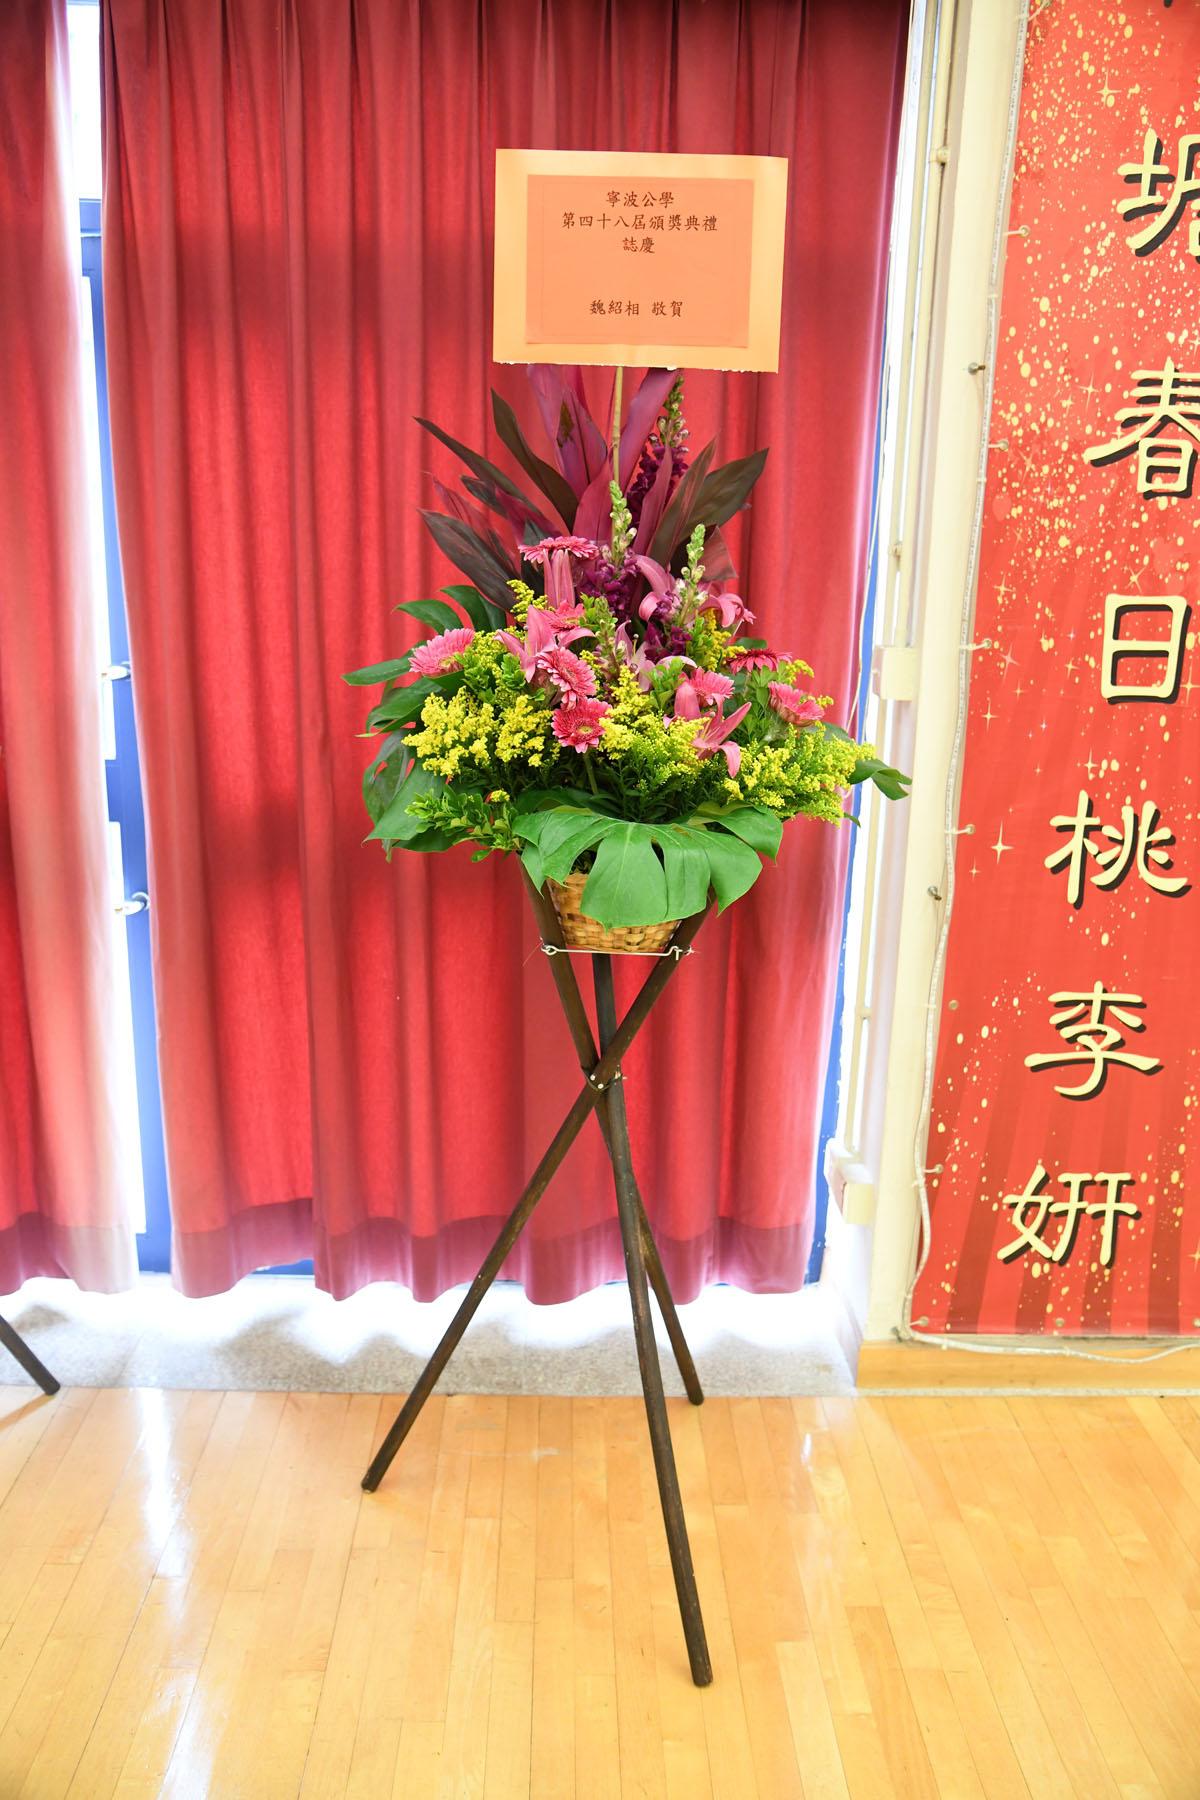 http://npc.edu.hk/sites/default/files/dsc_0254_1.jpg